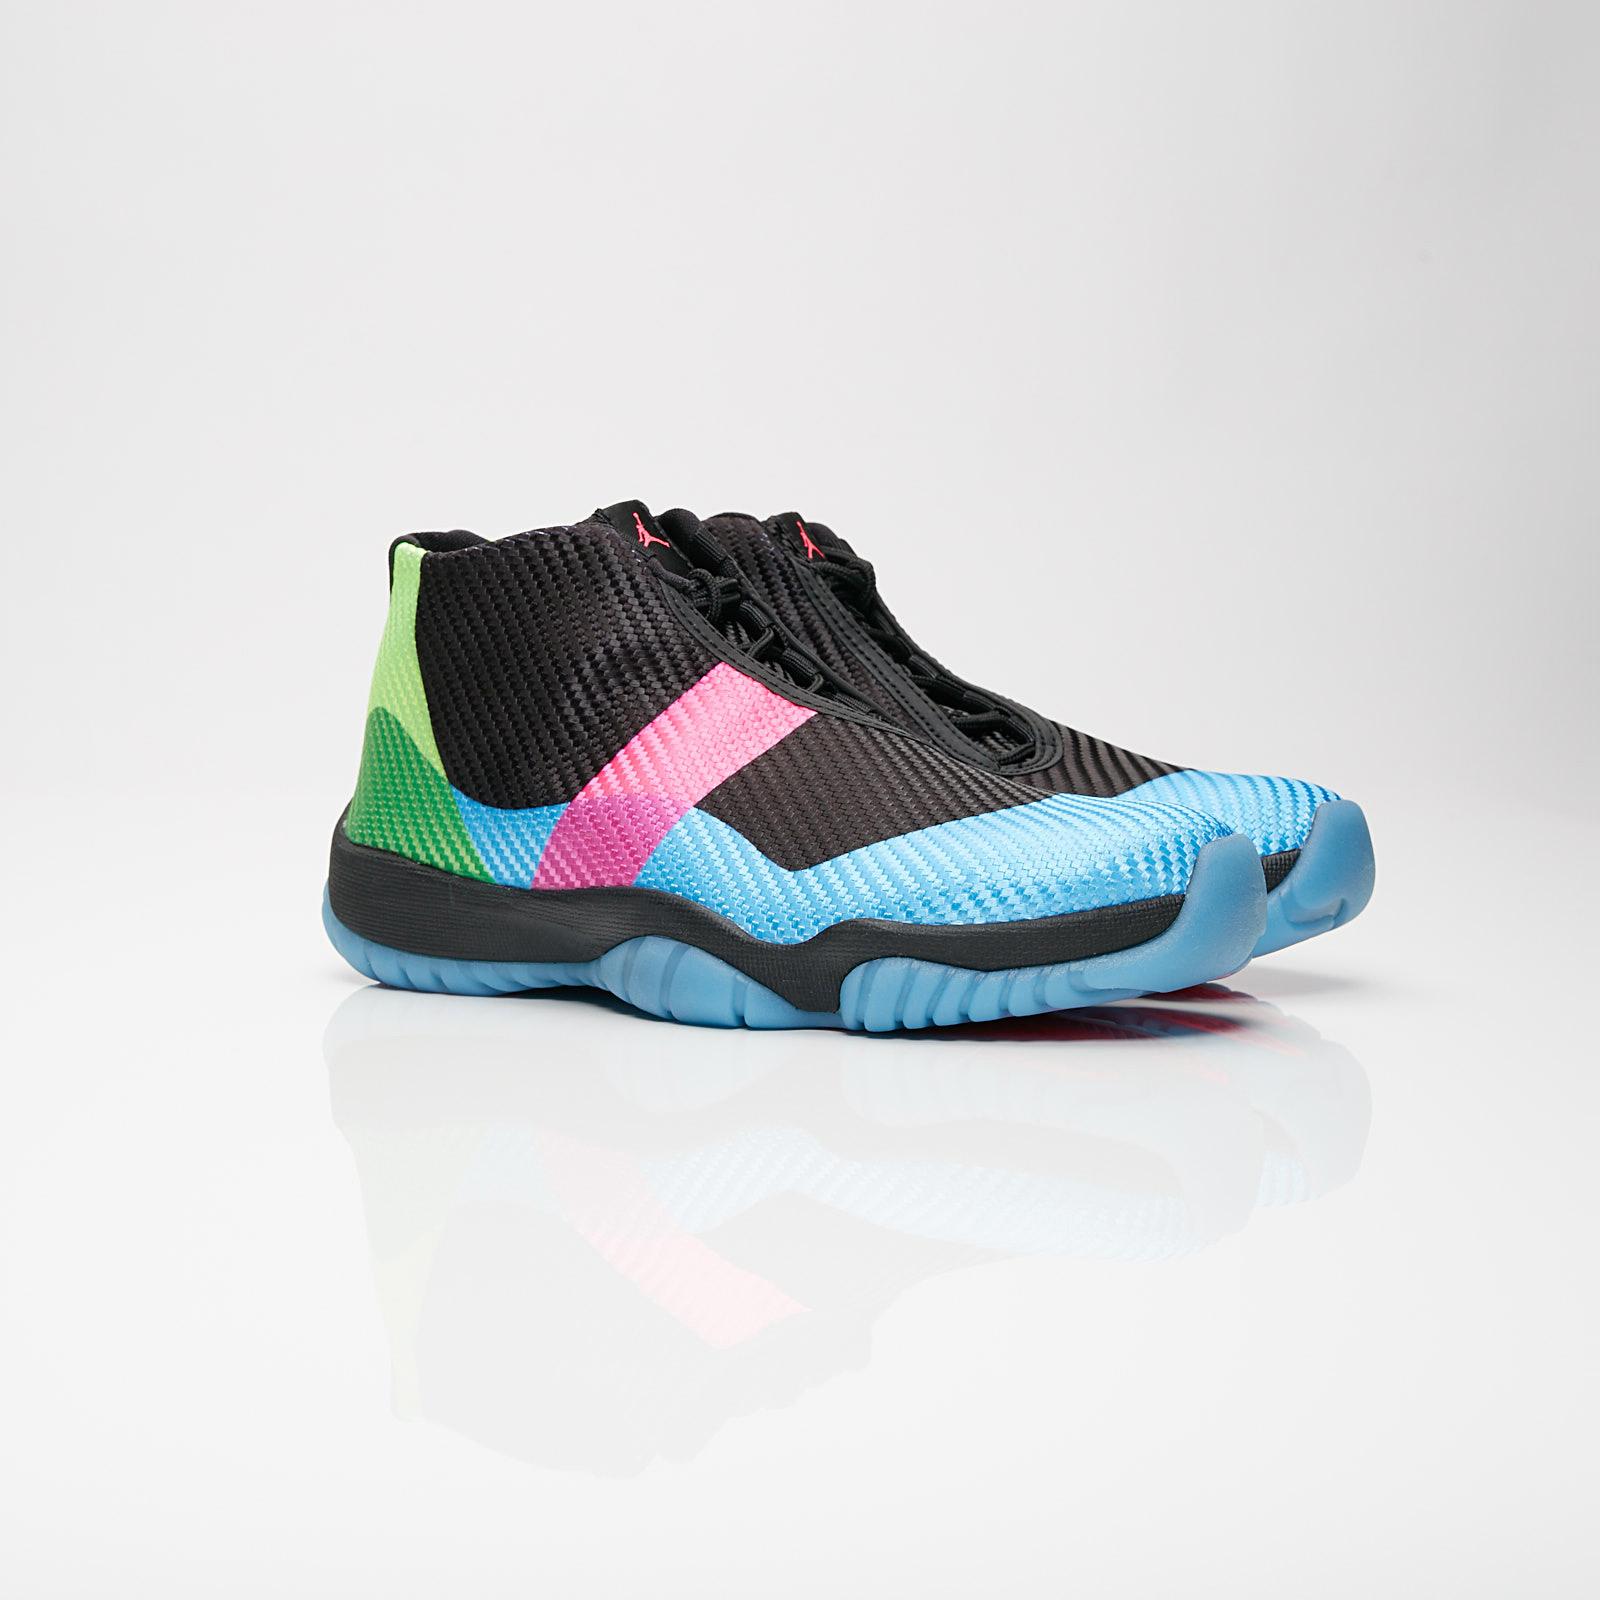 Jordan Brand Air Jordan Future Q54 GS - At9192-001 - Sneakersnstuff ... b4fbd2446